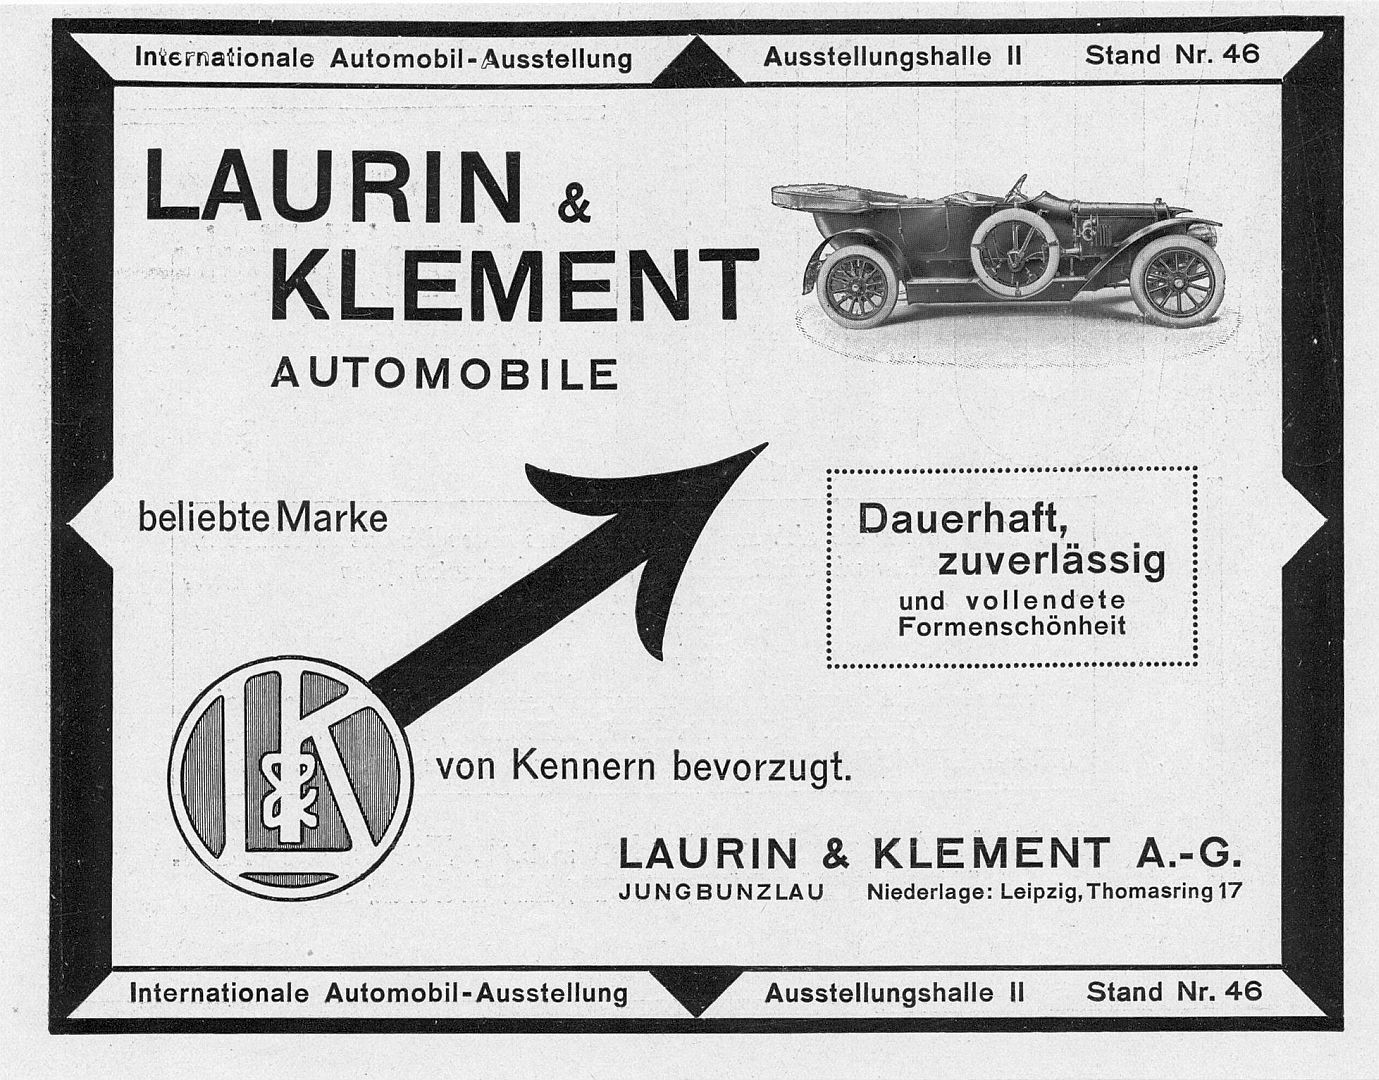 Laurin_Klement_Reklame_IAA_1911_Galerie